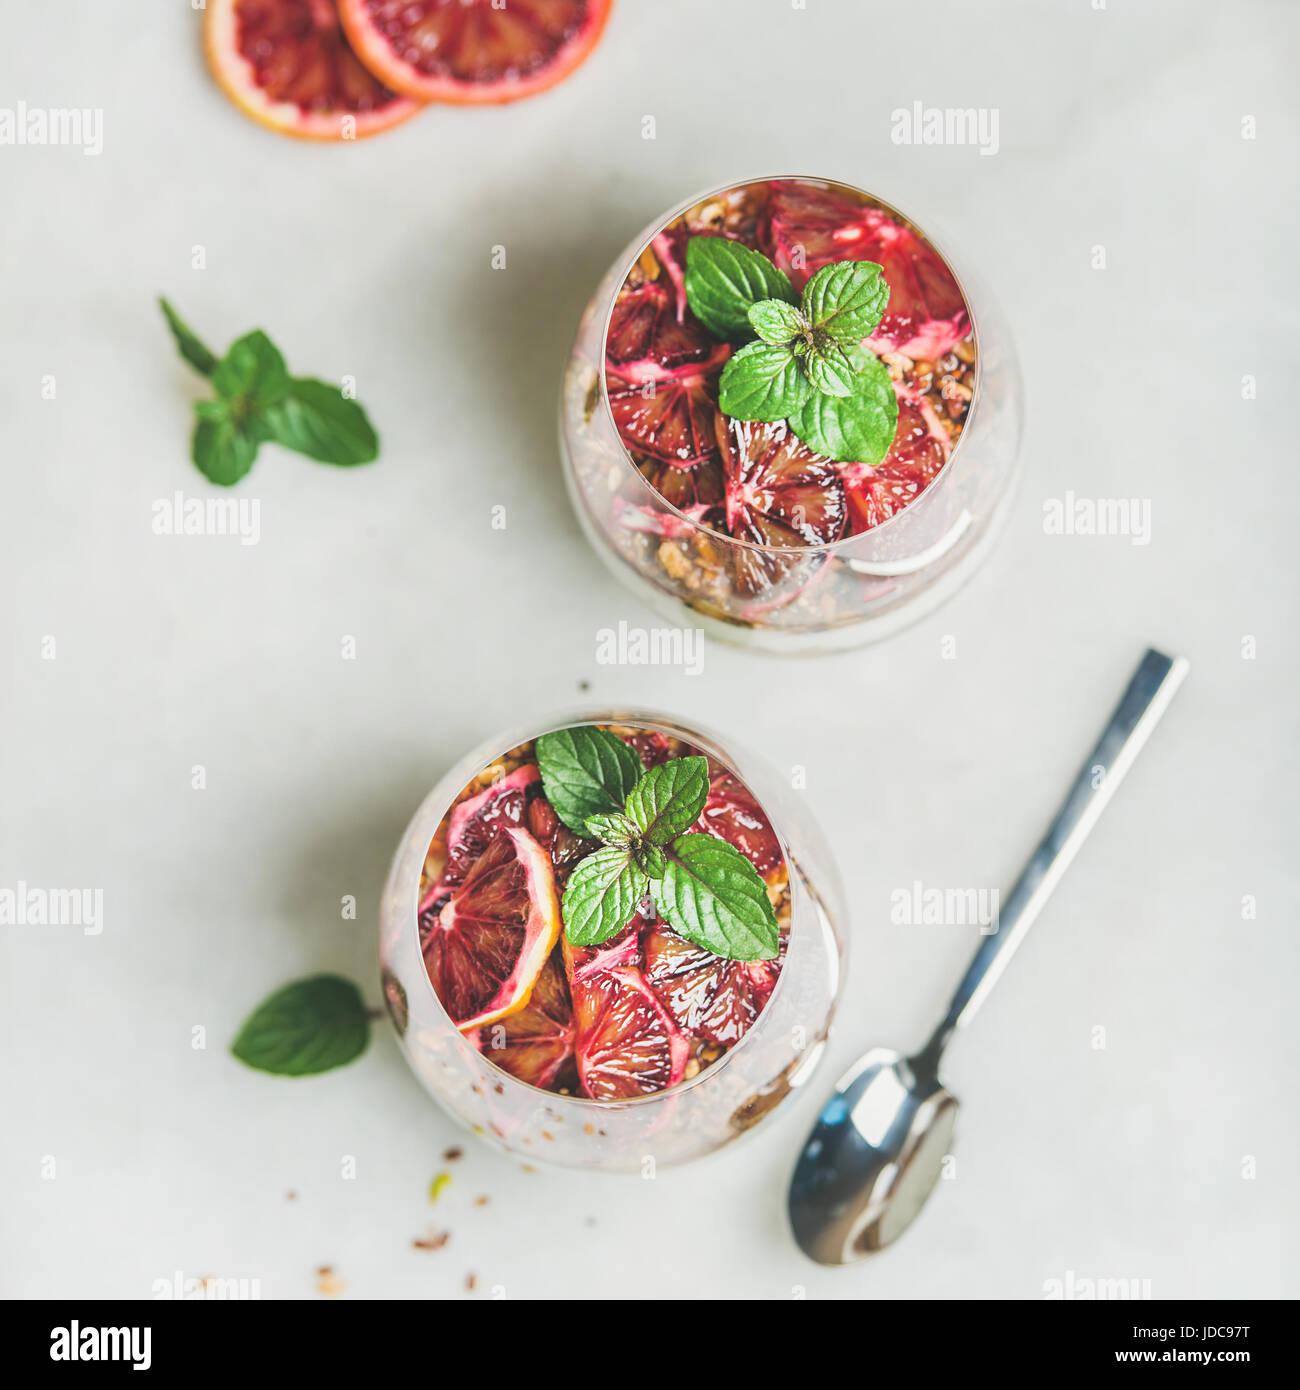 Desayuno saludable con yogurt, granola, naranja parfait de capas Imagen De Stock